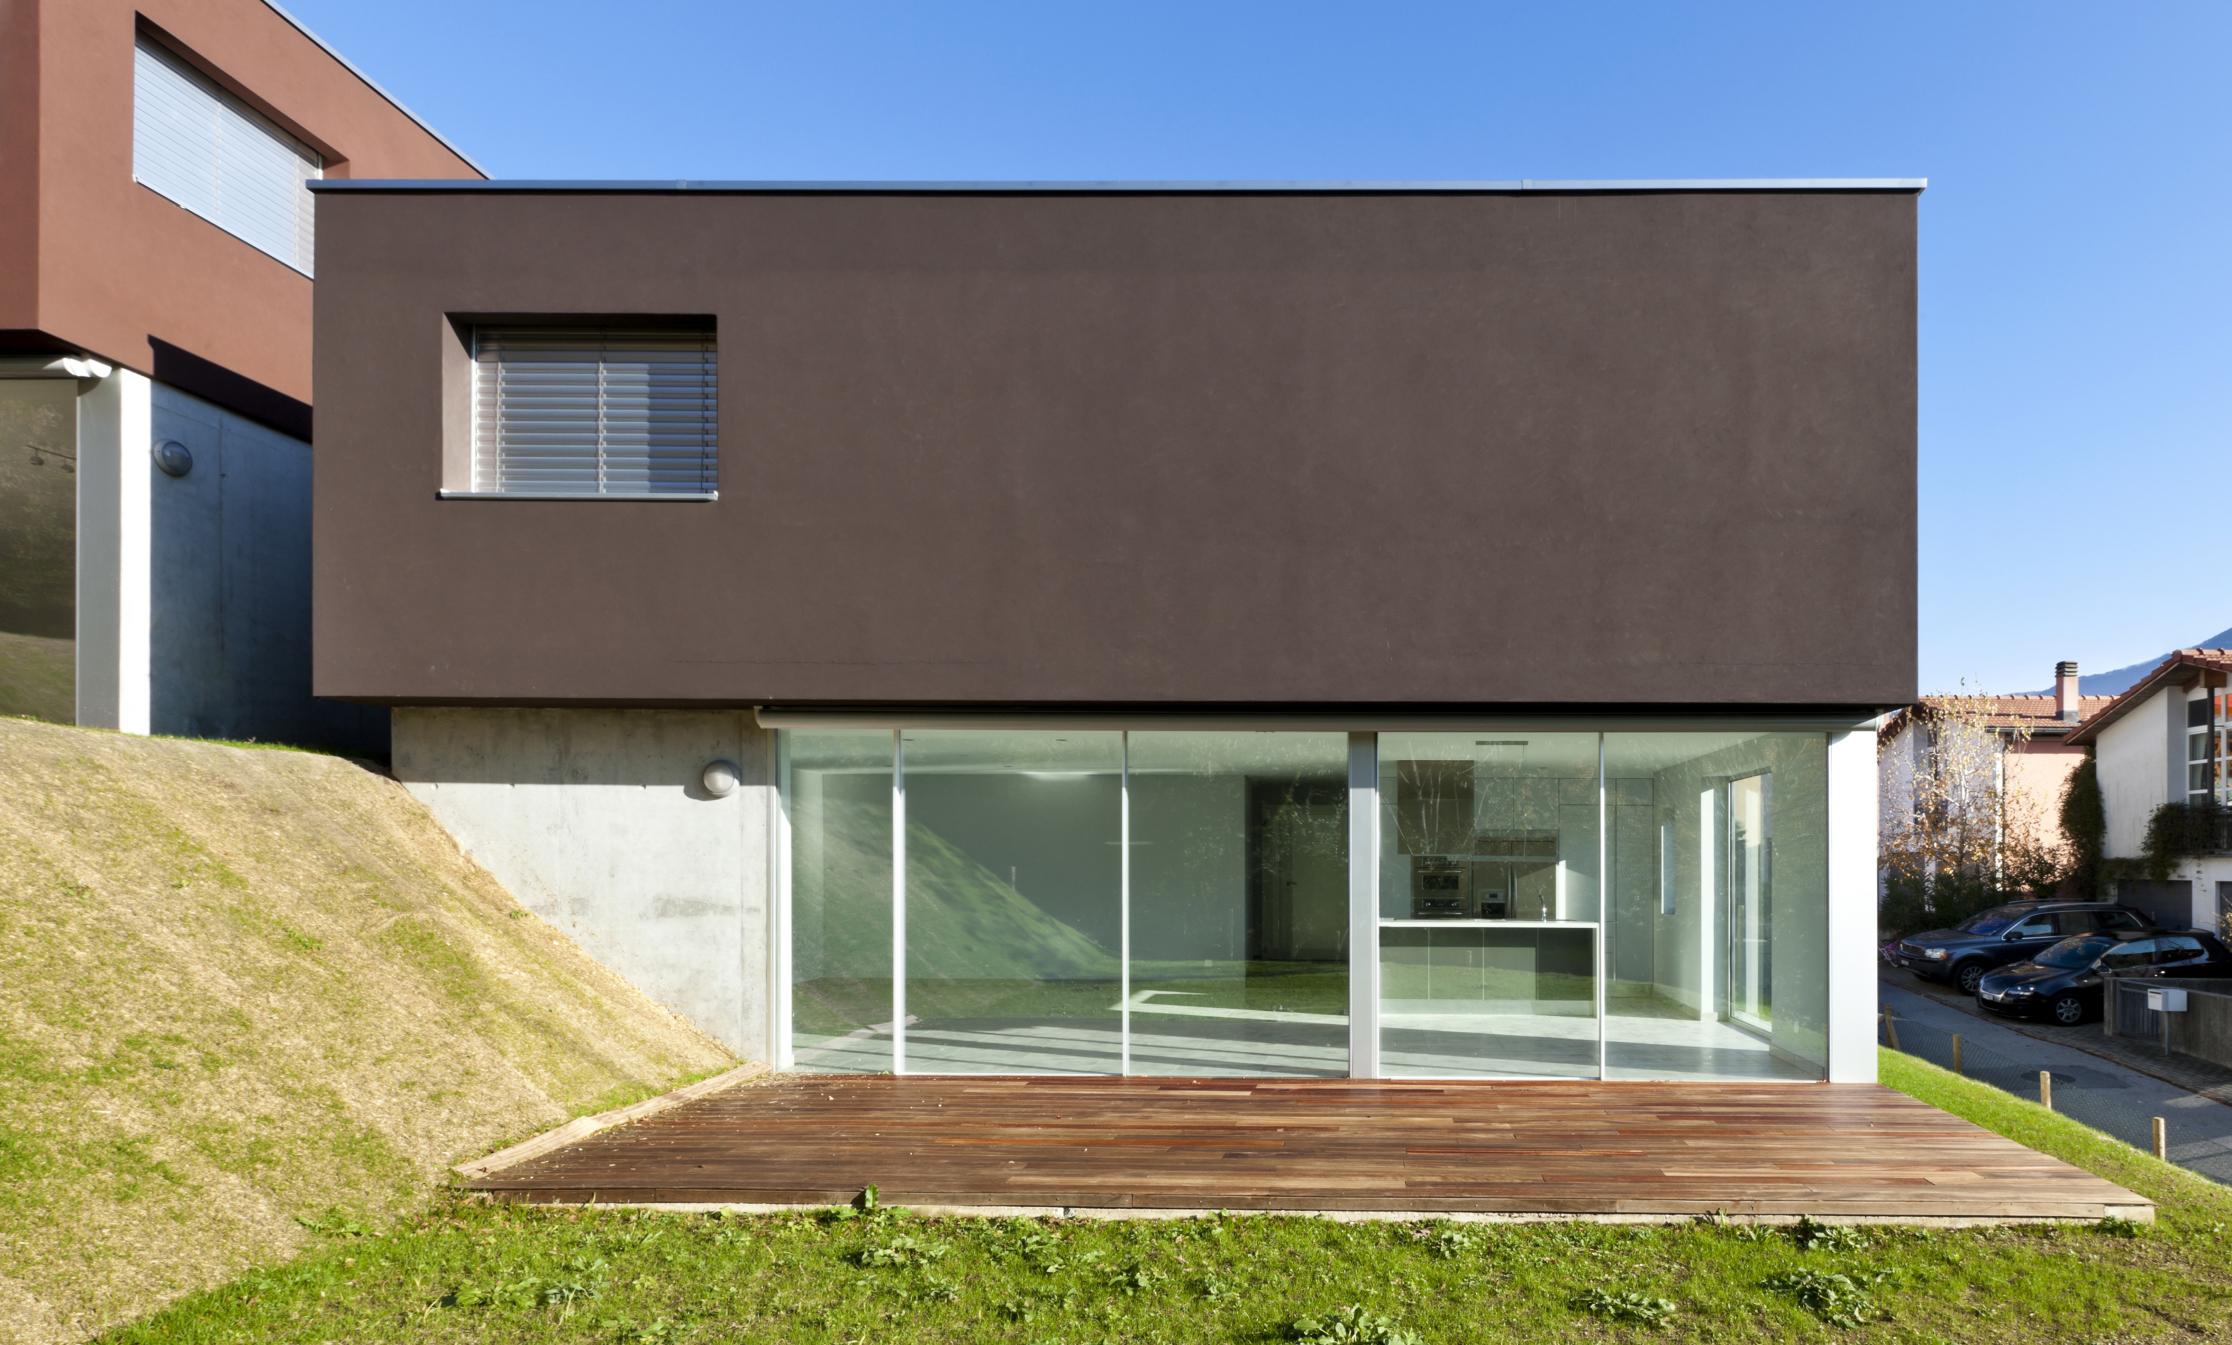 20 frentes de casas modernas planos y fachadas todo for Frente casa moderna